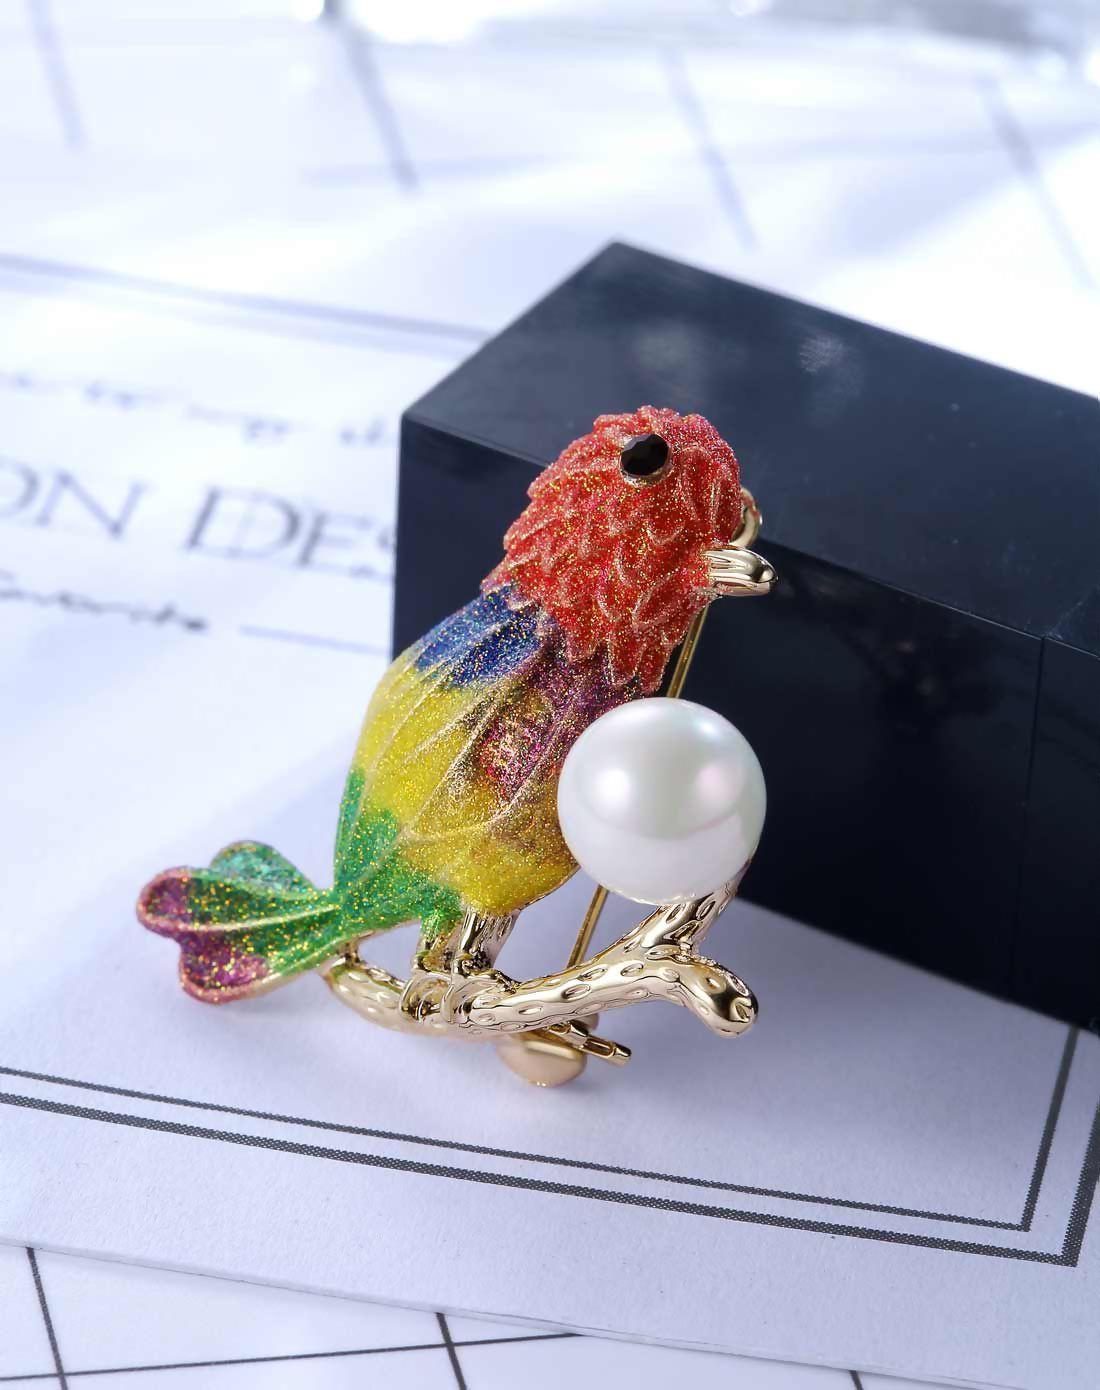 #AdoreWe #VIPme Brooches - Designer Viennois Viennois Colorful Nightingale Shape Imitation Pearl Brooch - AdoreWe.com